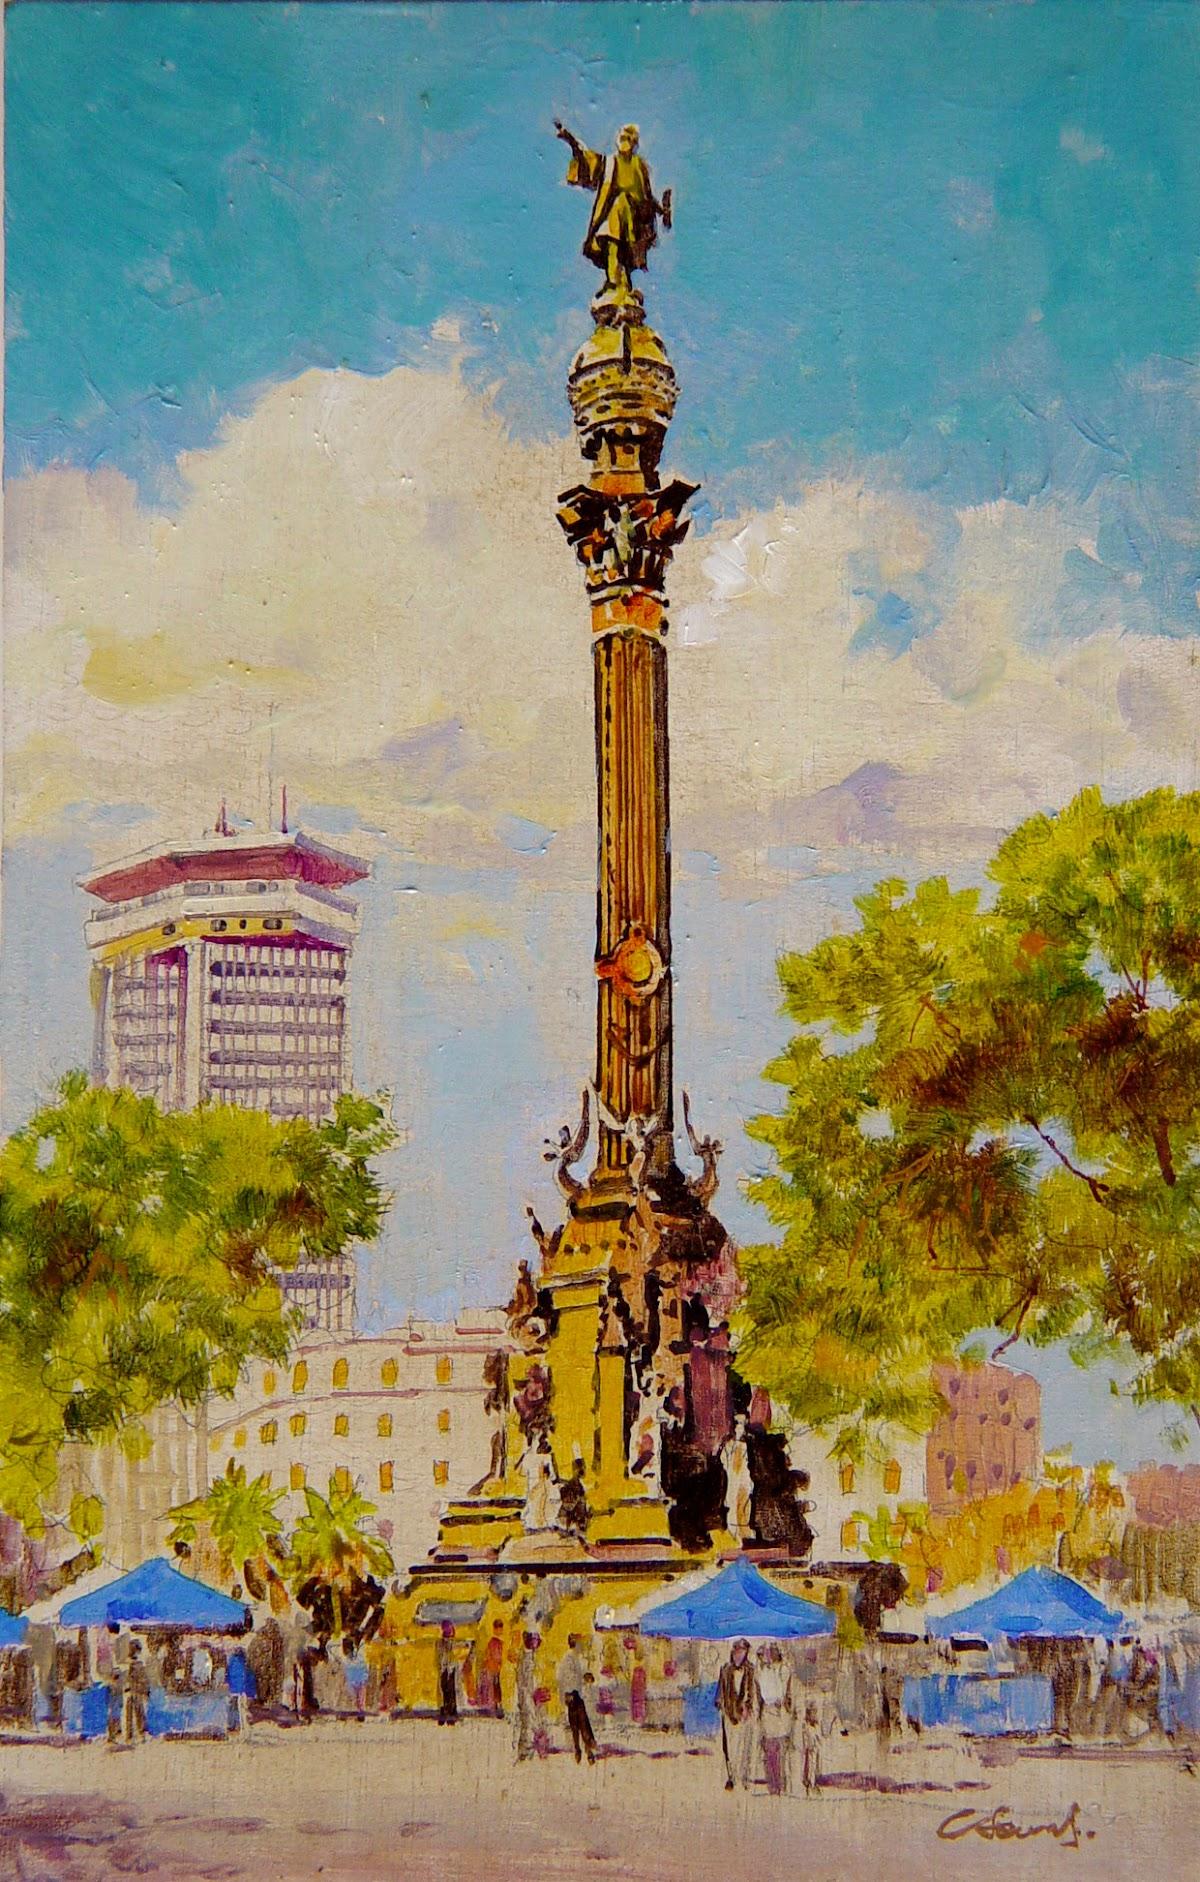 http://1.bp.blogspot.com/-iE-FmYhwtaU/USkdGnUor0I/AAAAAAAACtY/uMULVTZv0-k/s1882/Monumento+a+Colo%CC%81n.jpg